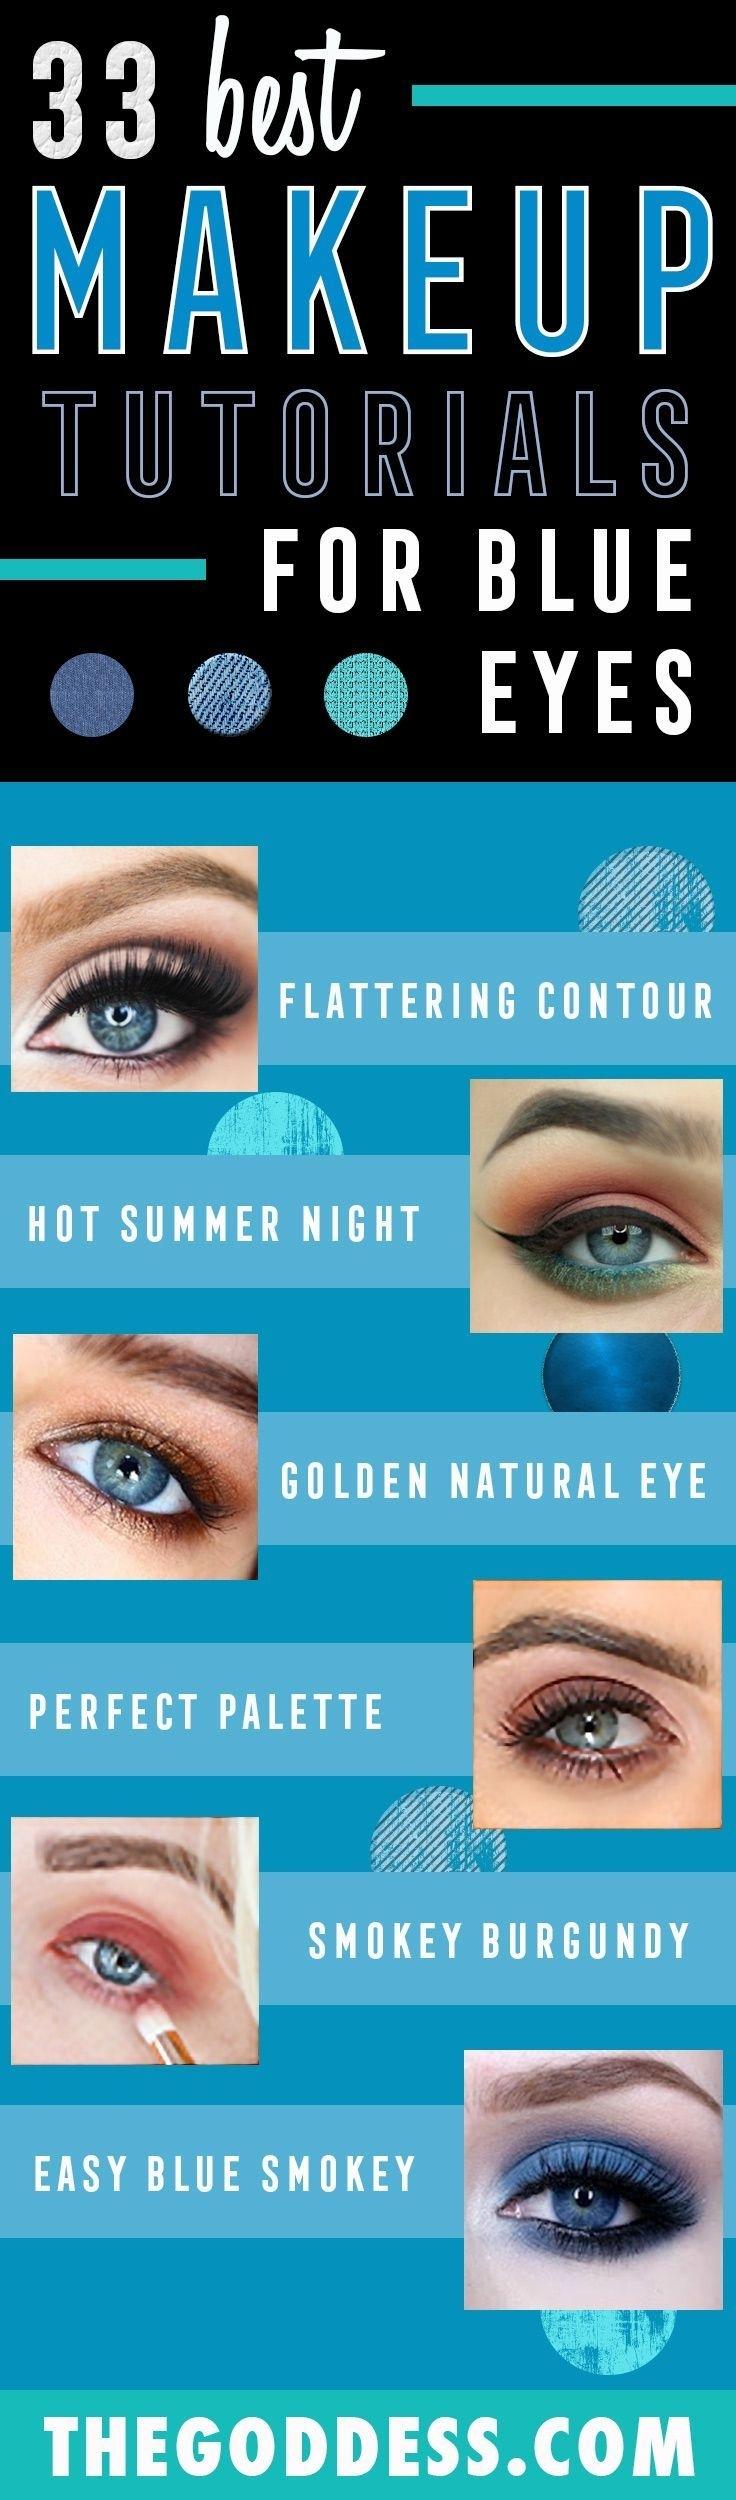 33 Best Makeup Tutorials For Blue Eyes | Fair Skin Makeup regarding Eye Makeup Colors For Blue Eyes And Pale Skin